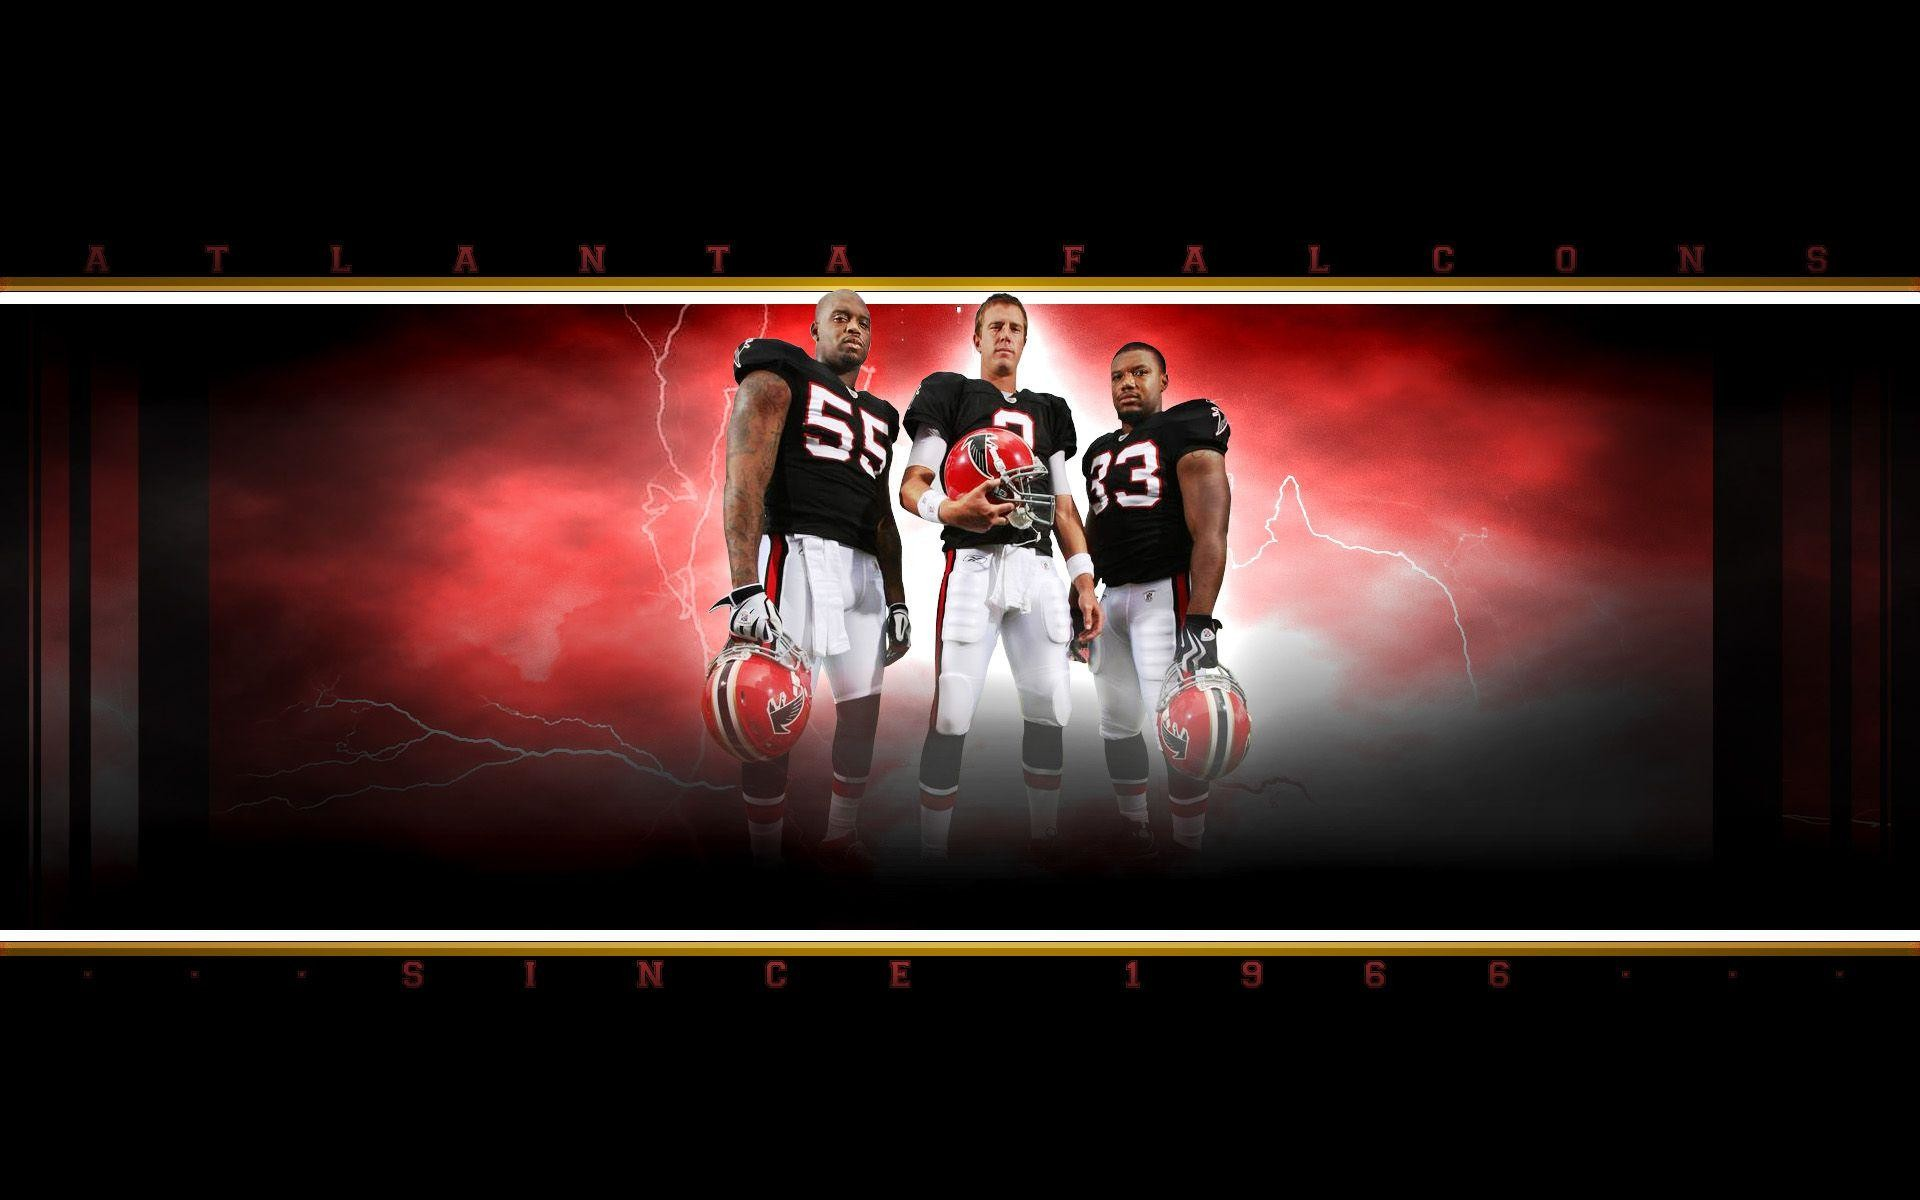 Atlanta Falcons Wallpaper Download Free Cool Full Hd: Atlanta Falcons Desktop Wallpaper ·① WallpaperTag